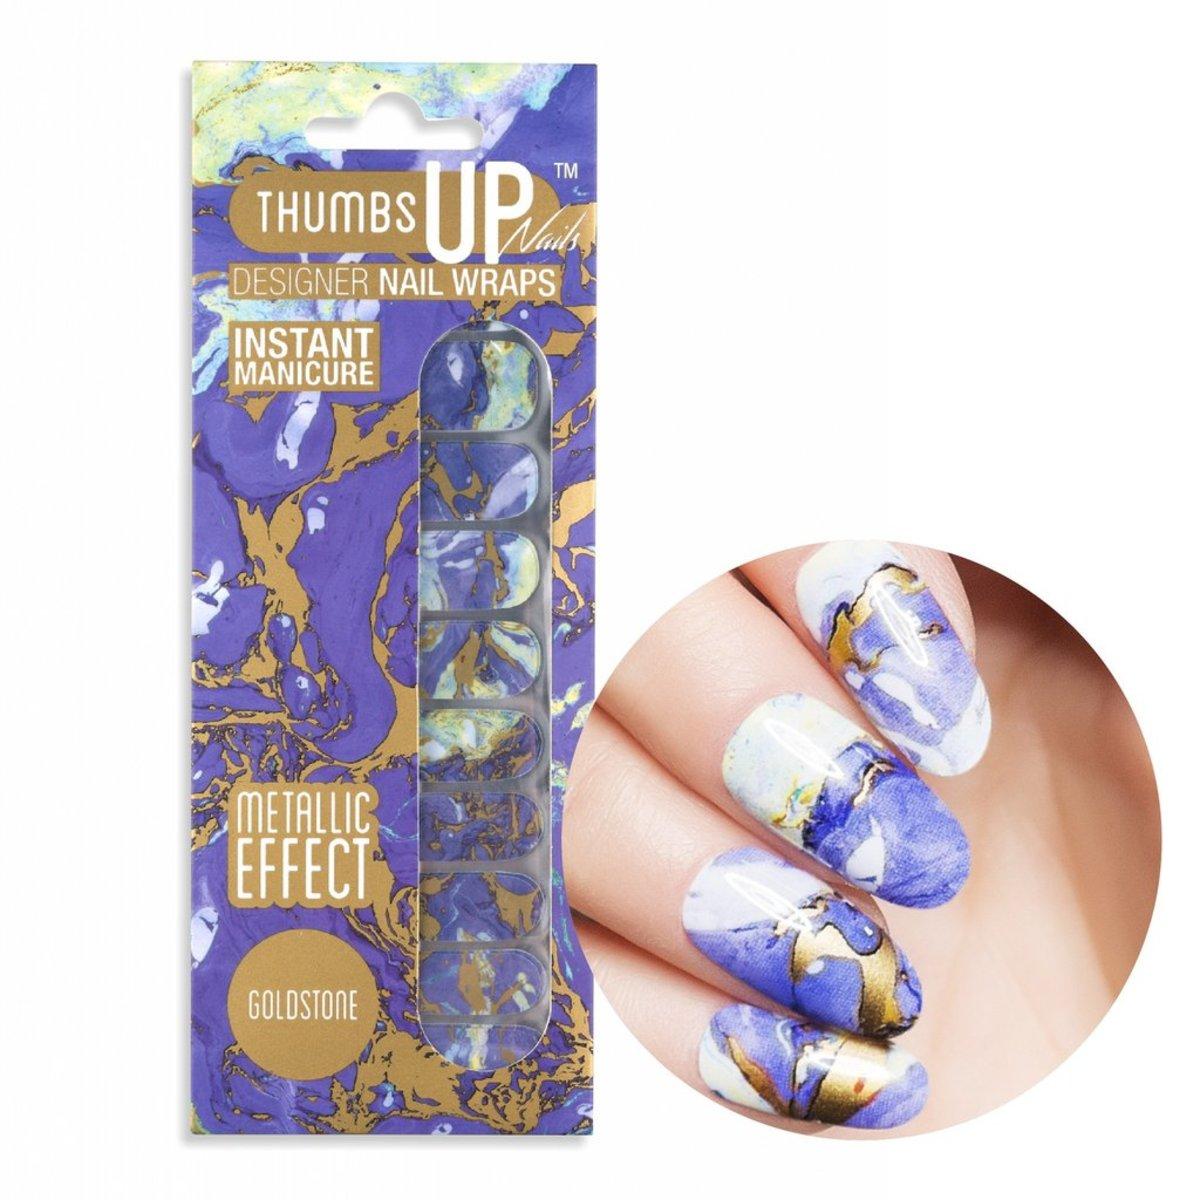 Thumbsup Nails Designer Nail Wraps Goldstone Hktvmall Online